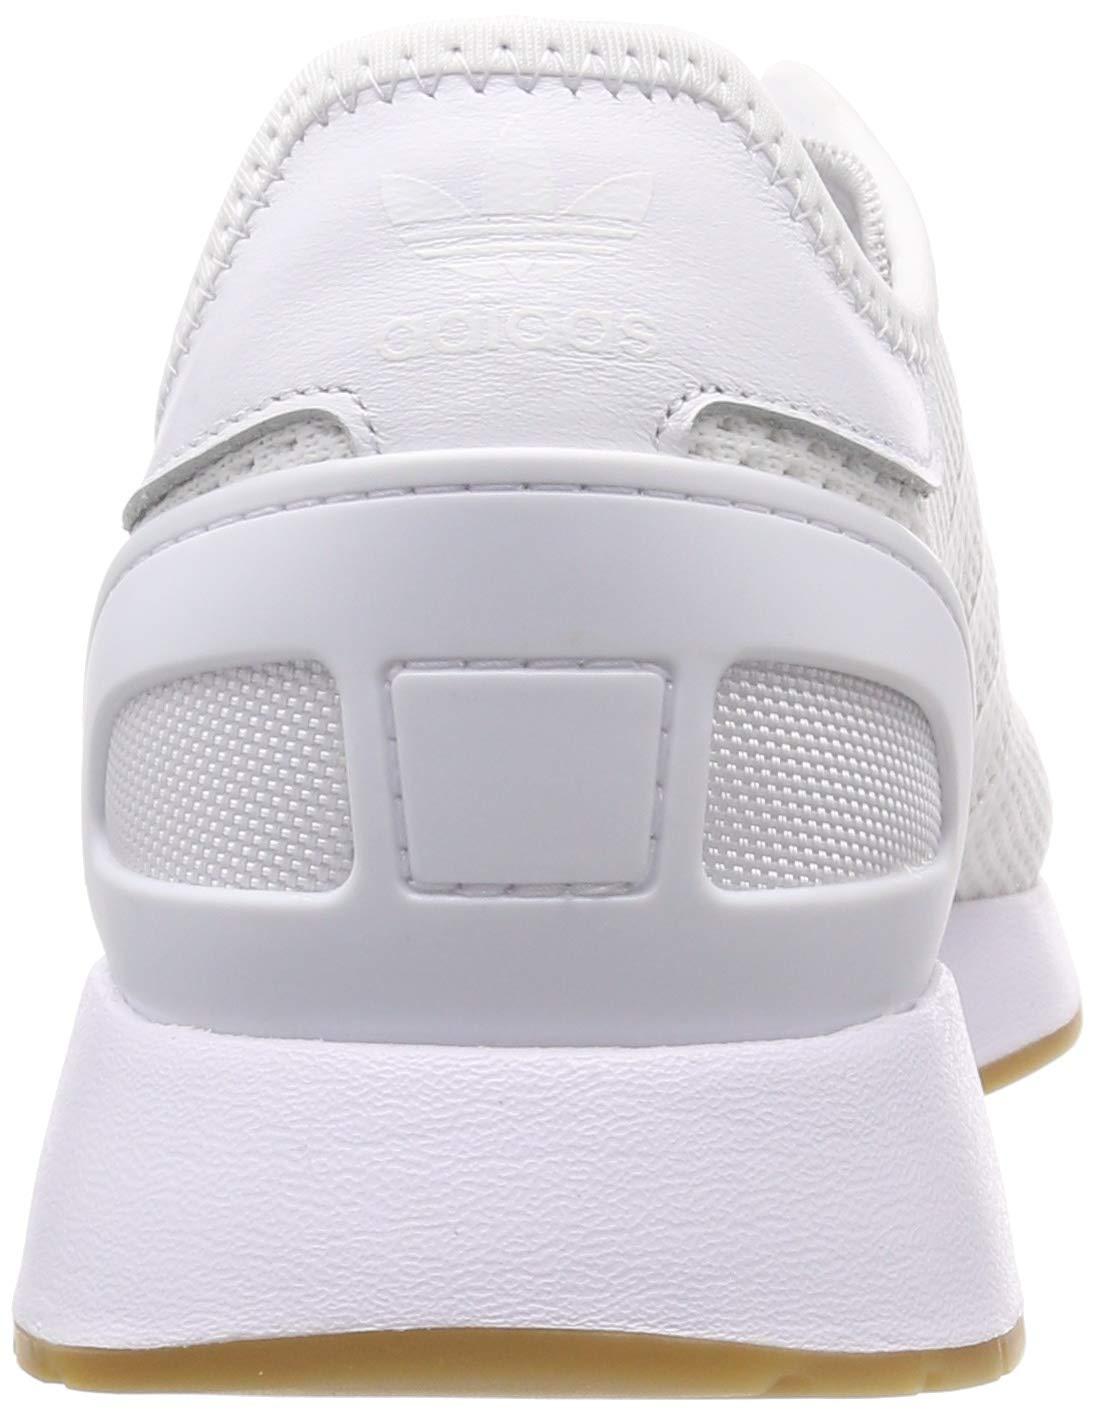 adidas Prophere, Scarpe da Ginnastica Uomo – Spesavip